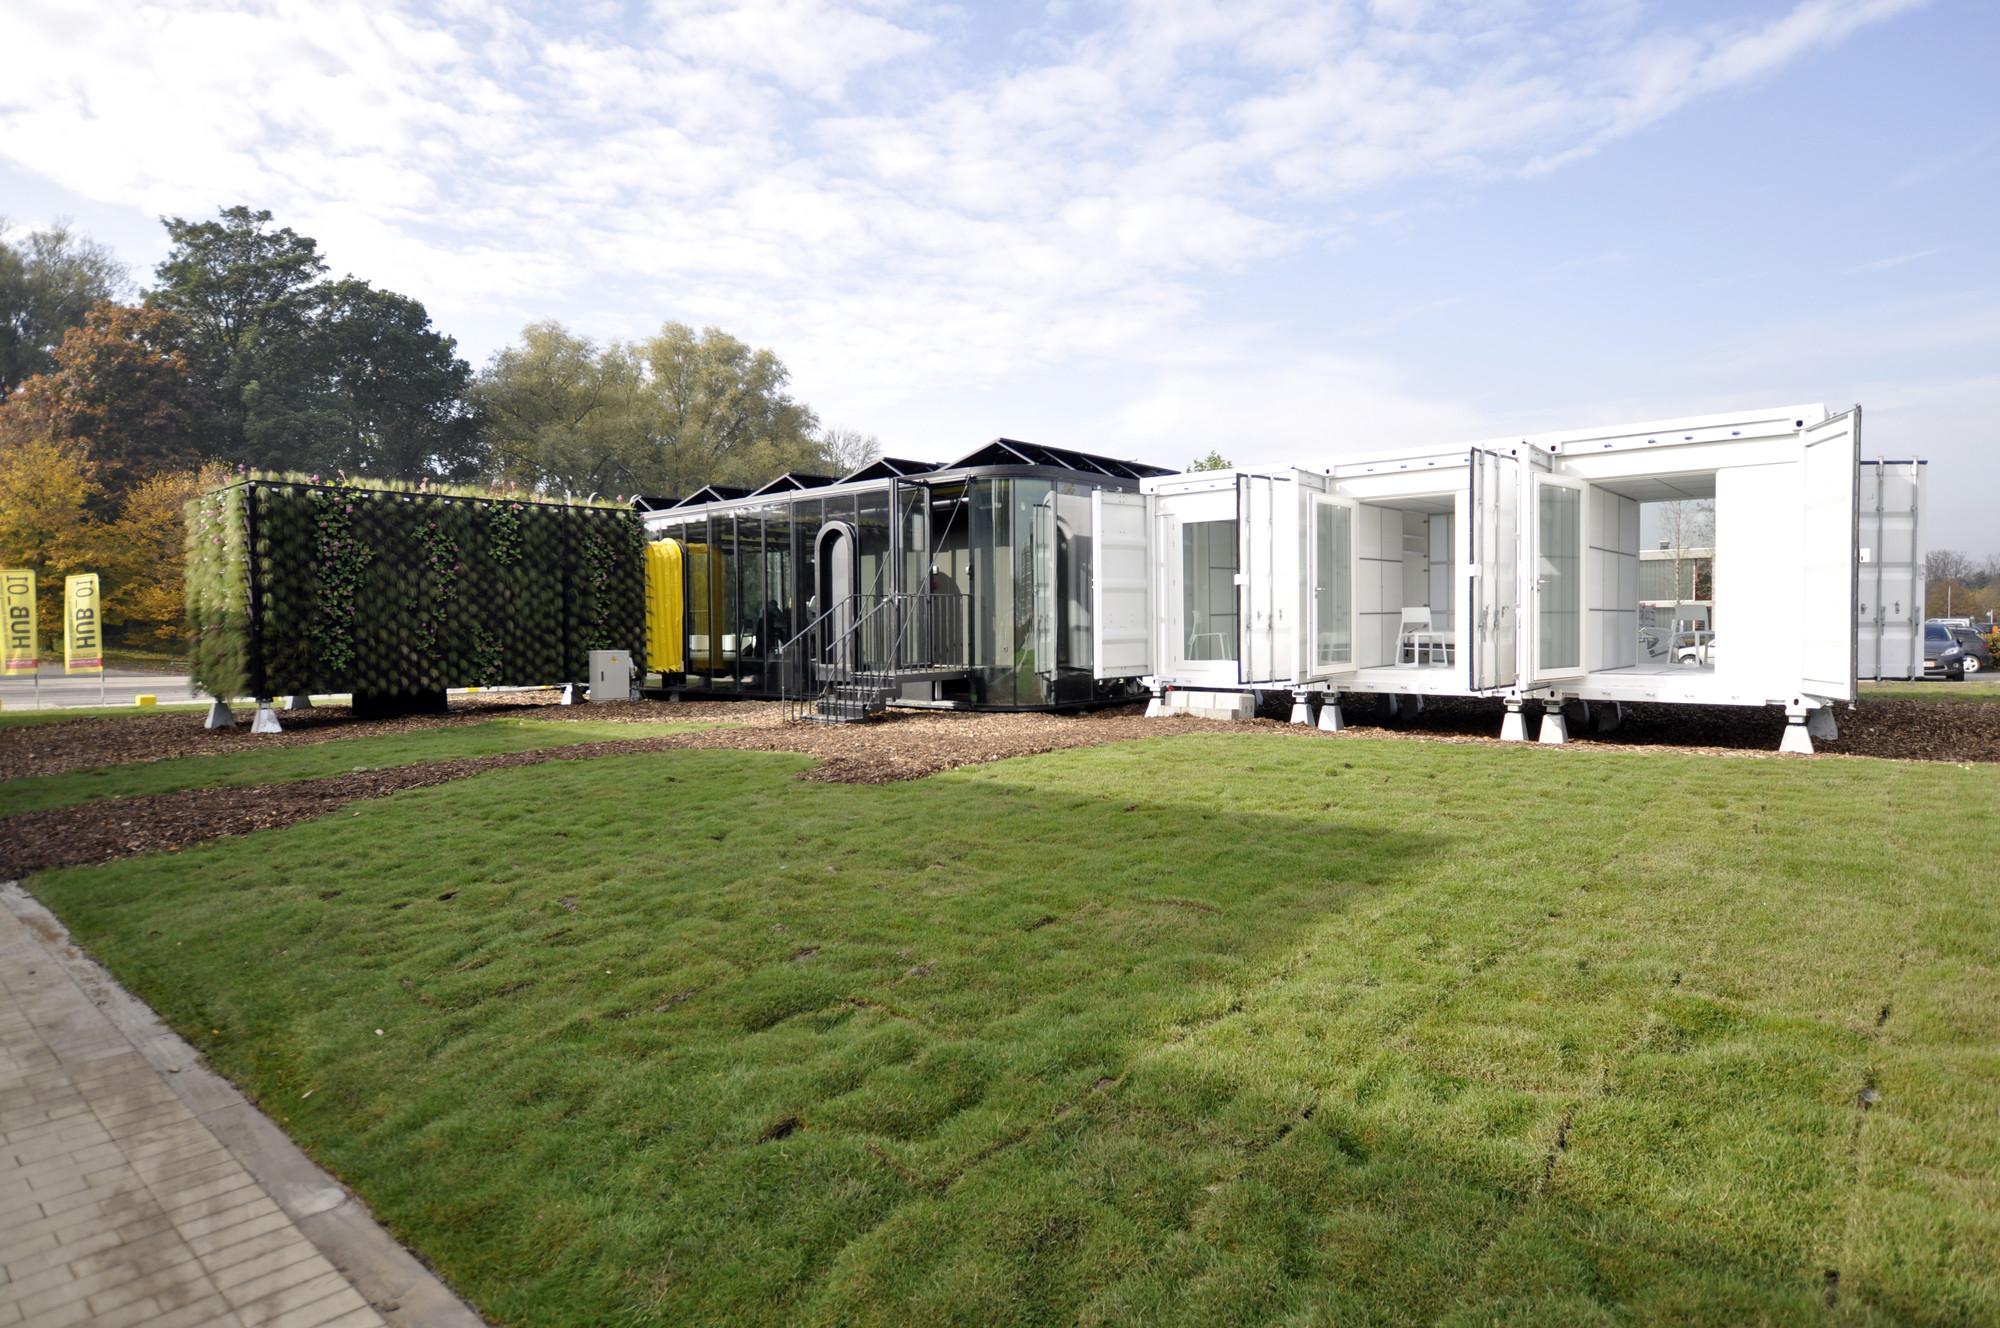 Hub 01 - Mobile Student Housing Terminal / dmvA Architecten + A3 Architects